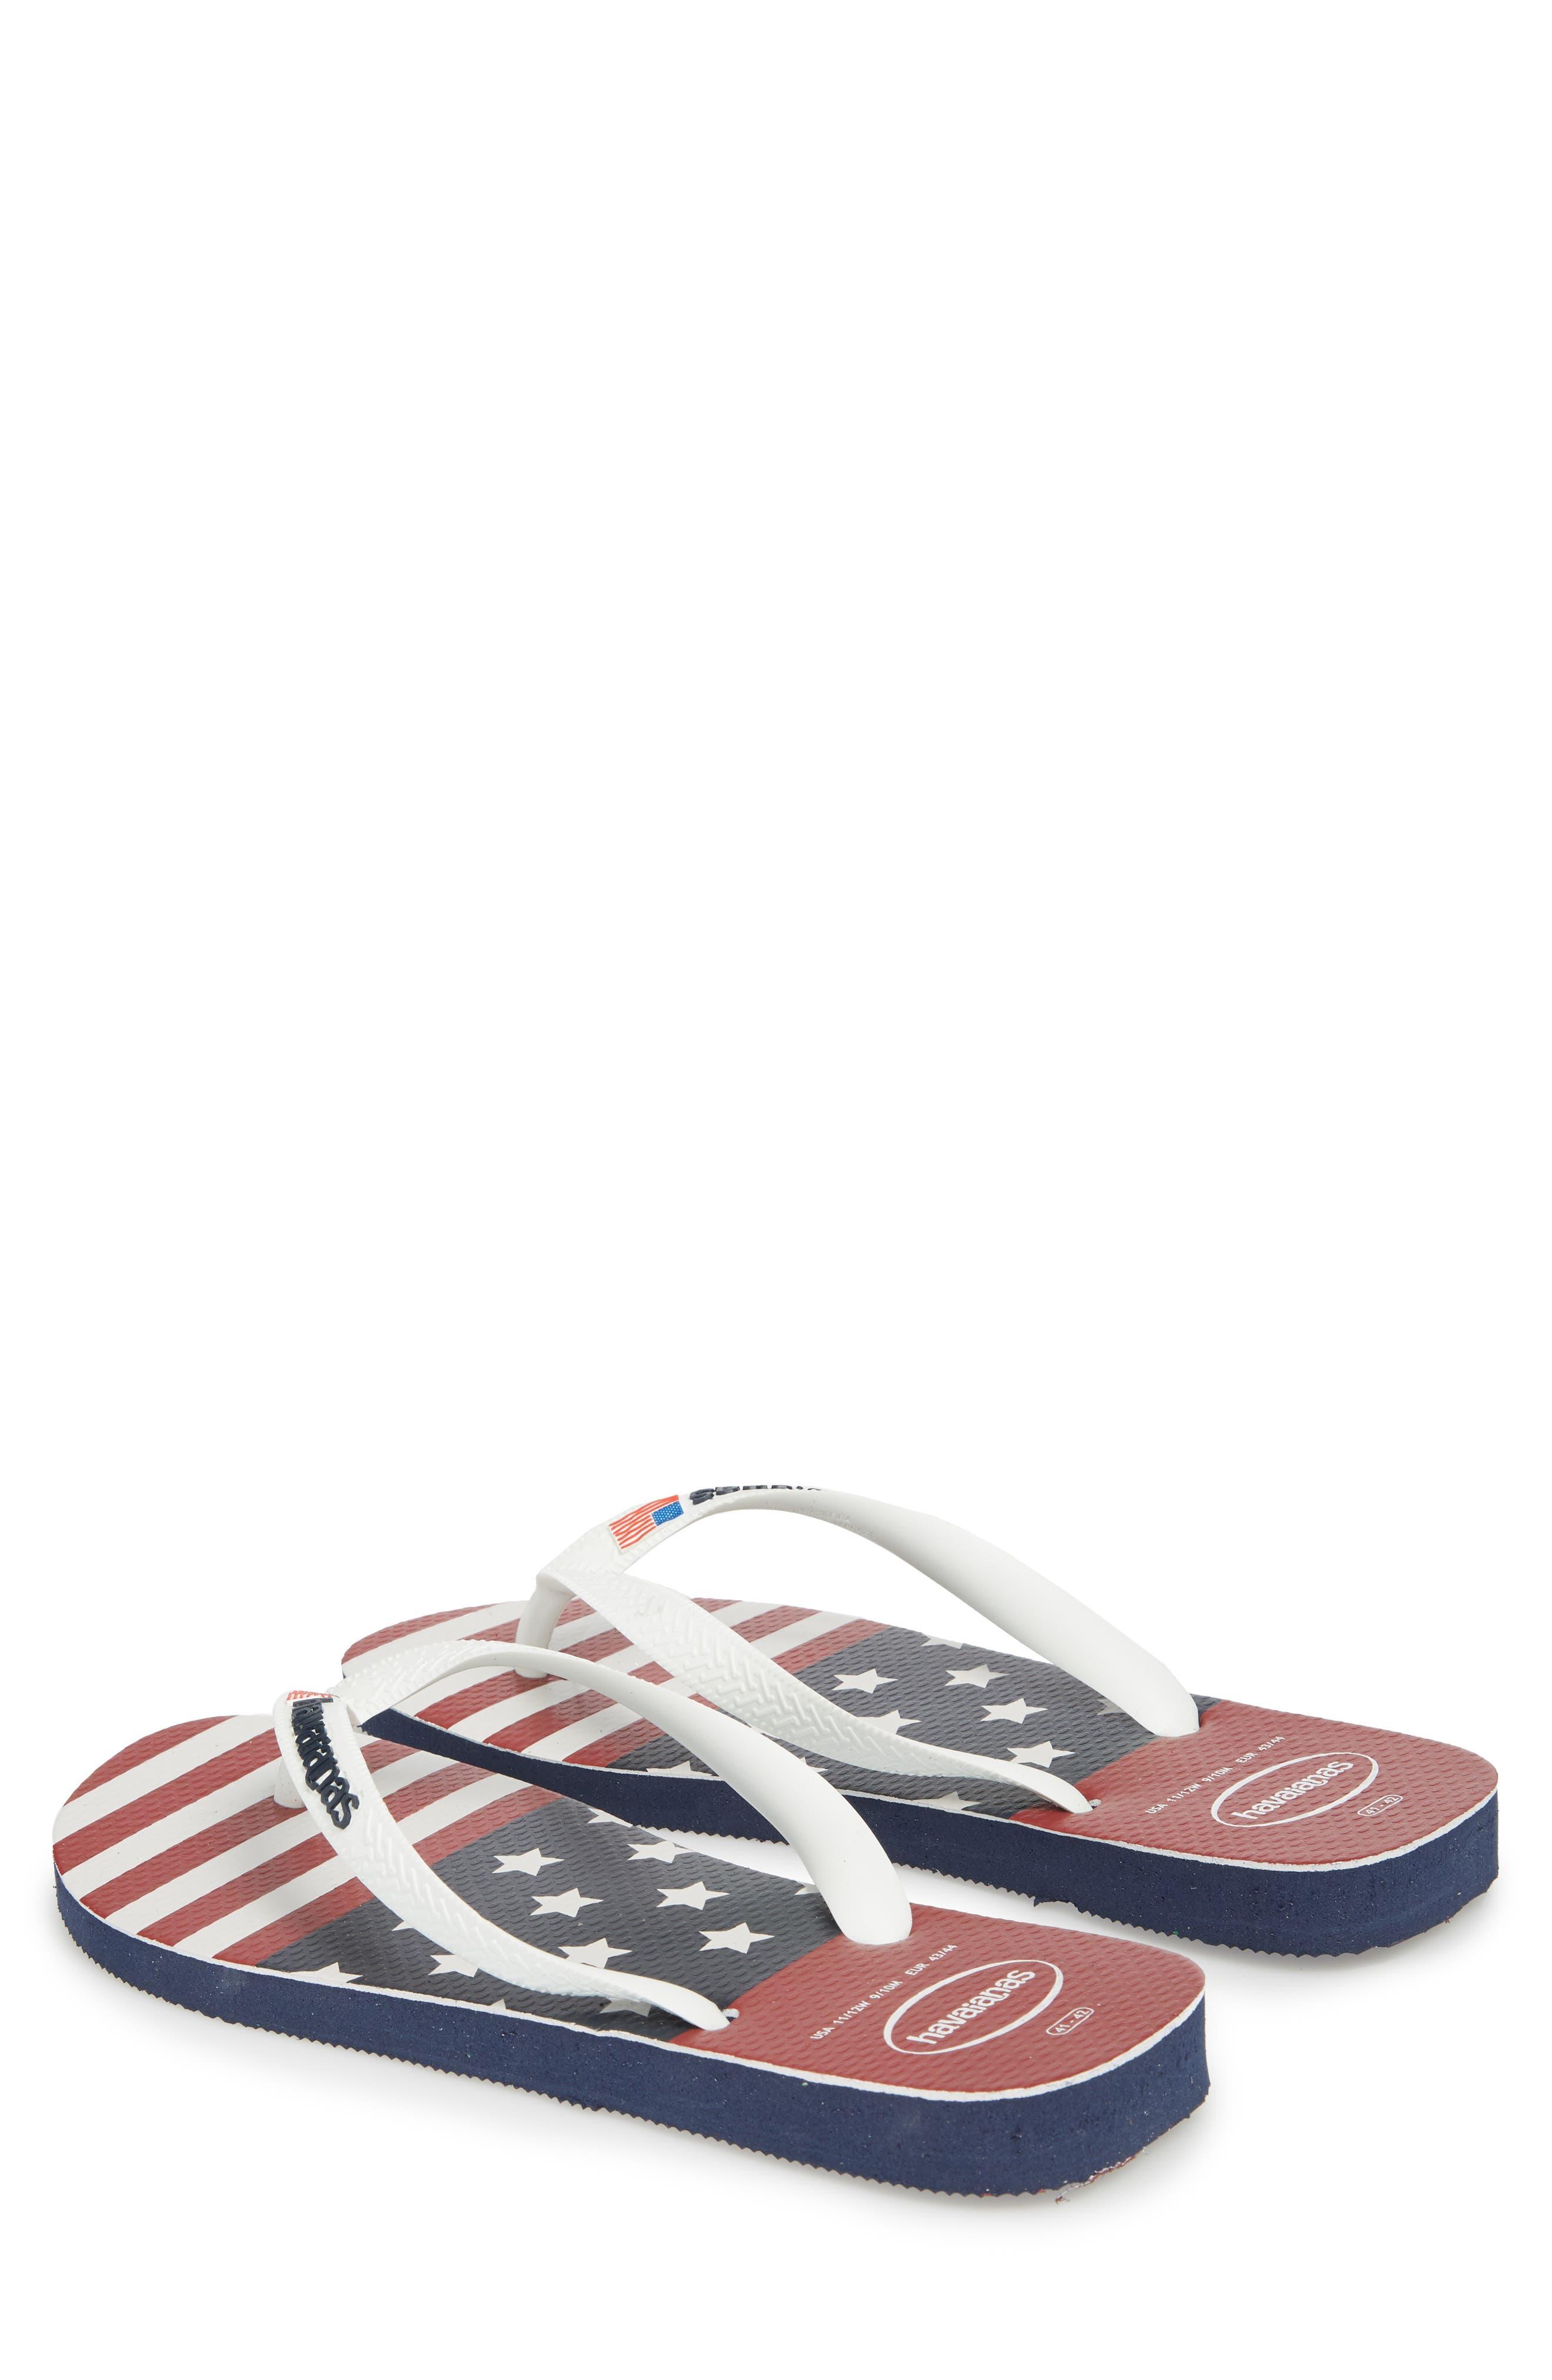 USA Stars & Stripes Flip Flop,                             Alternate thumbnail 3, color,                             Navy Blue